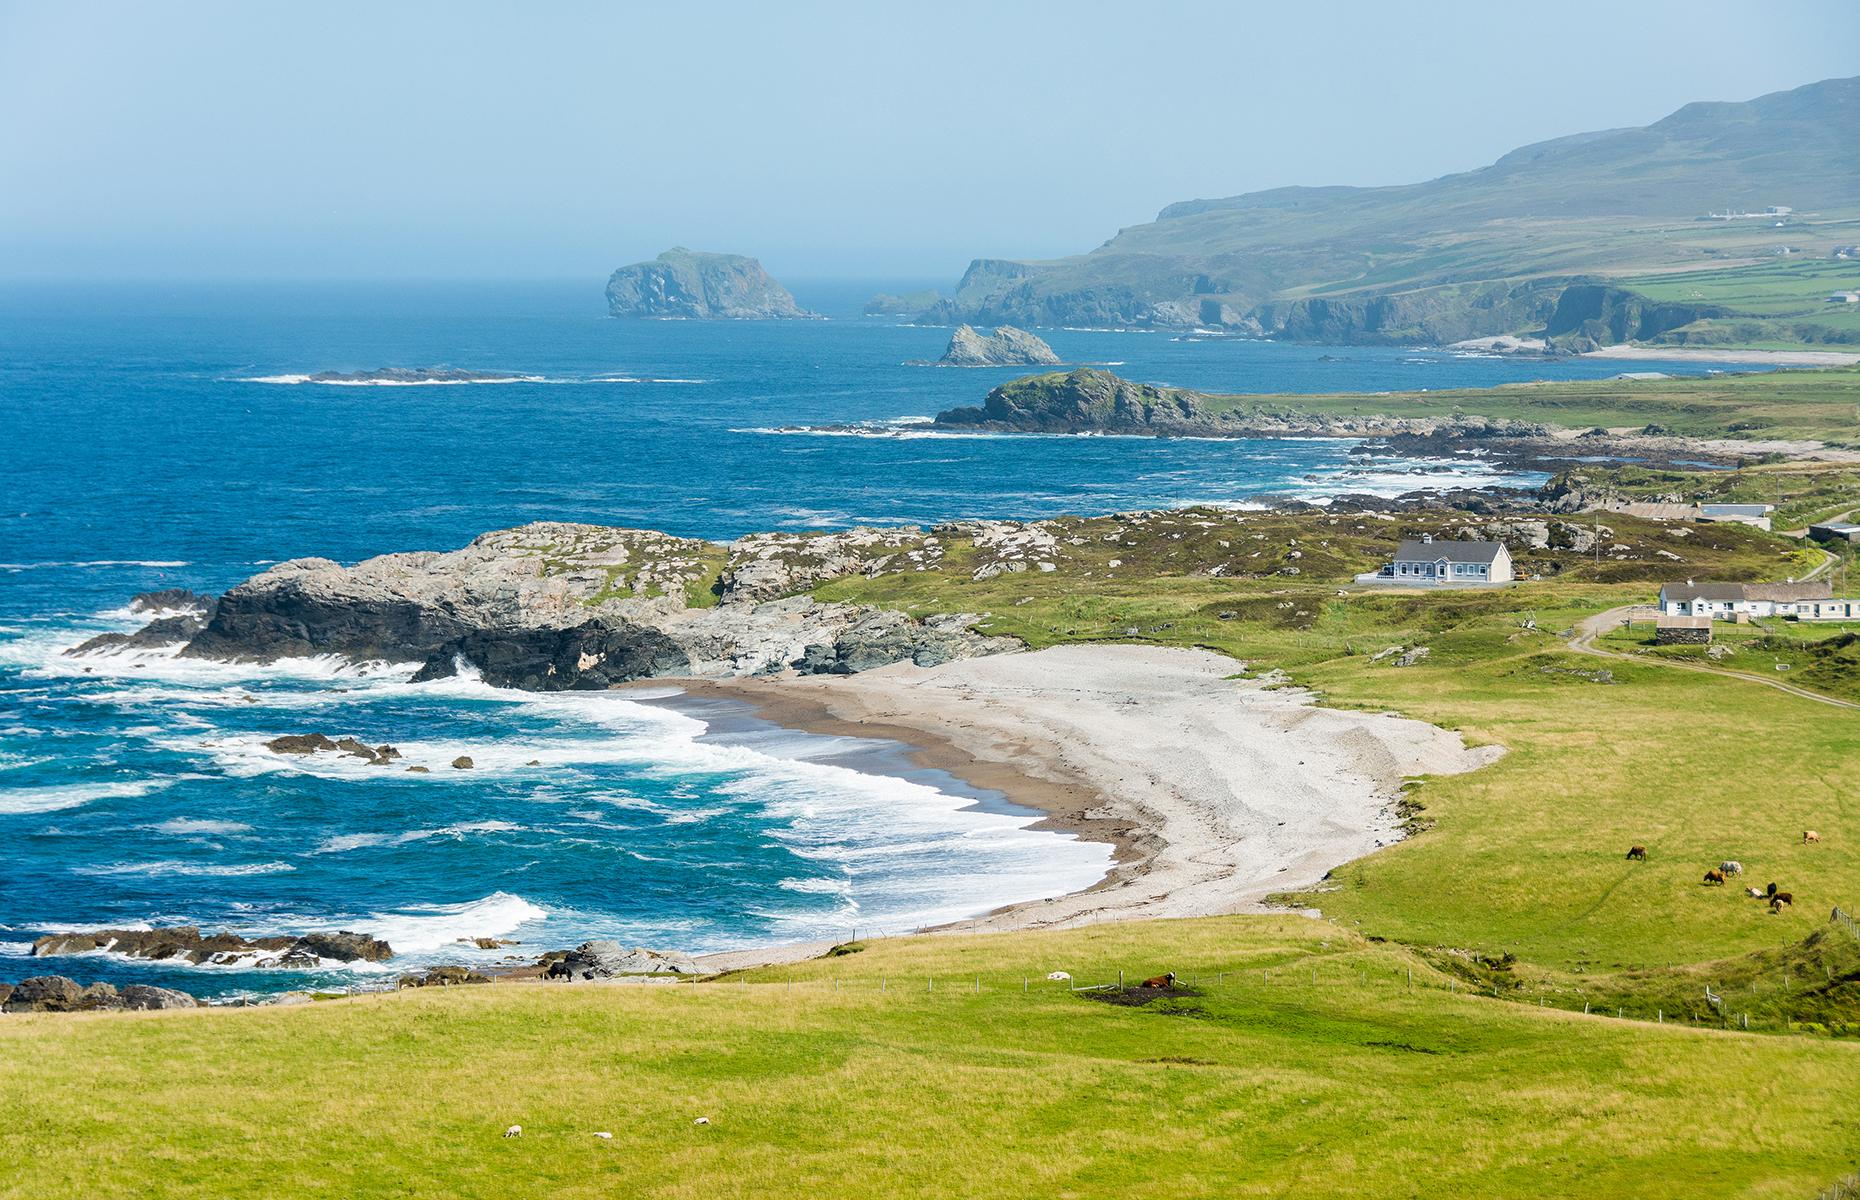 County Donegal, Malin Head (Image: Lucky Team Studio/Shutterstock)